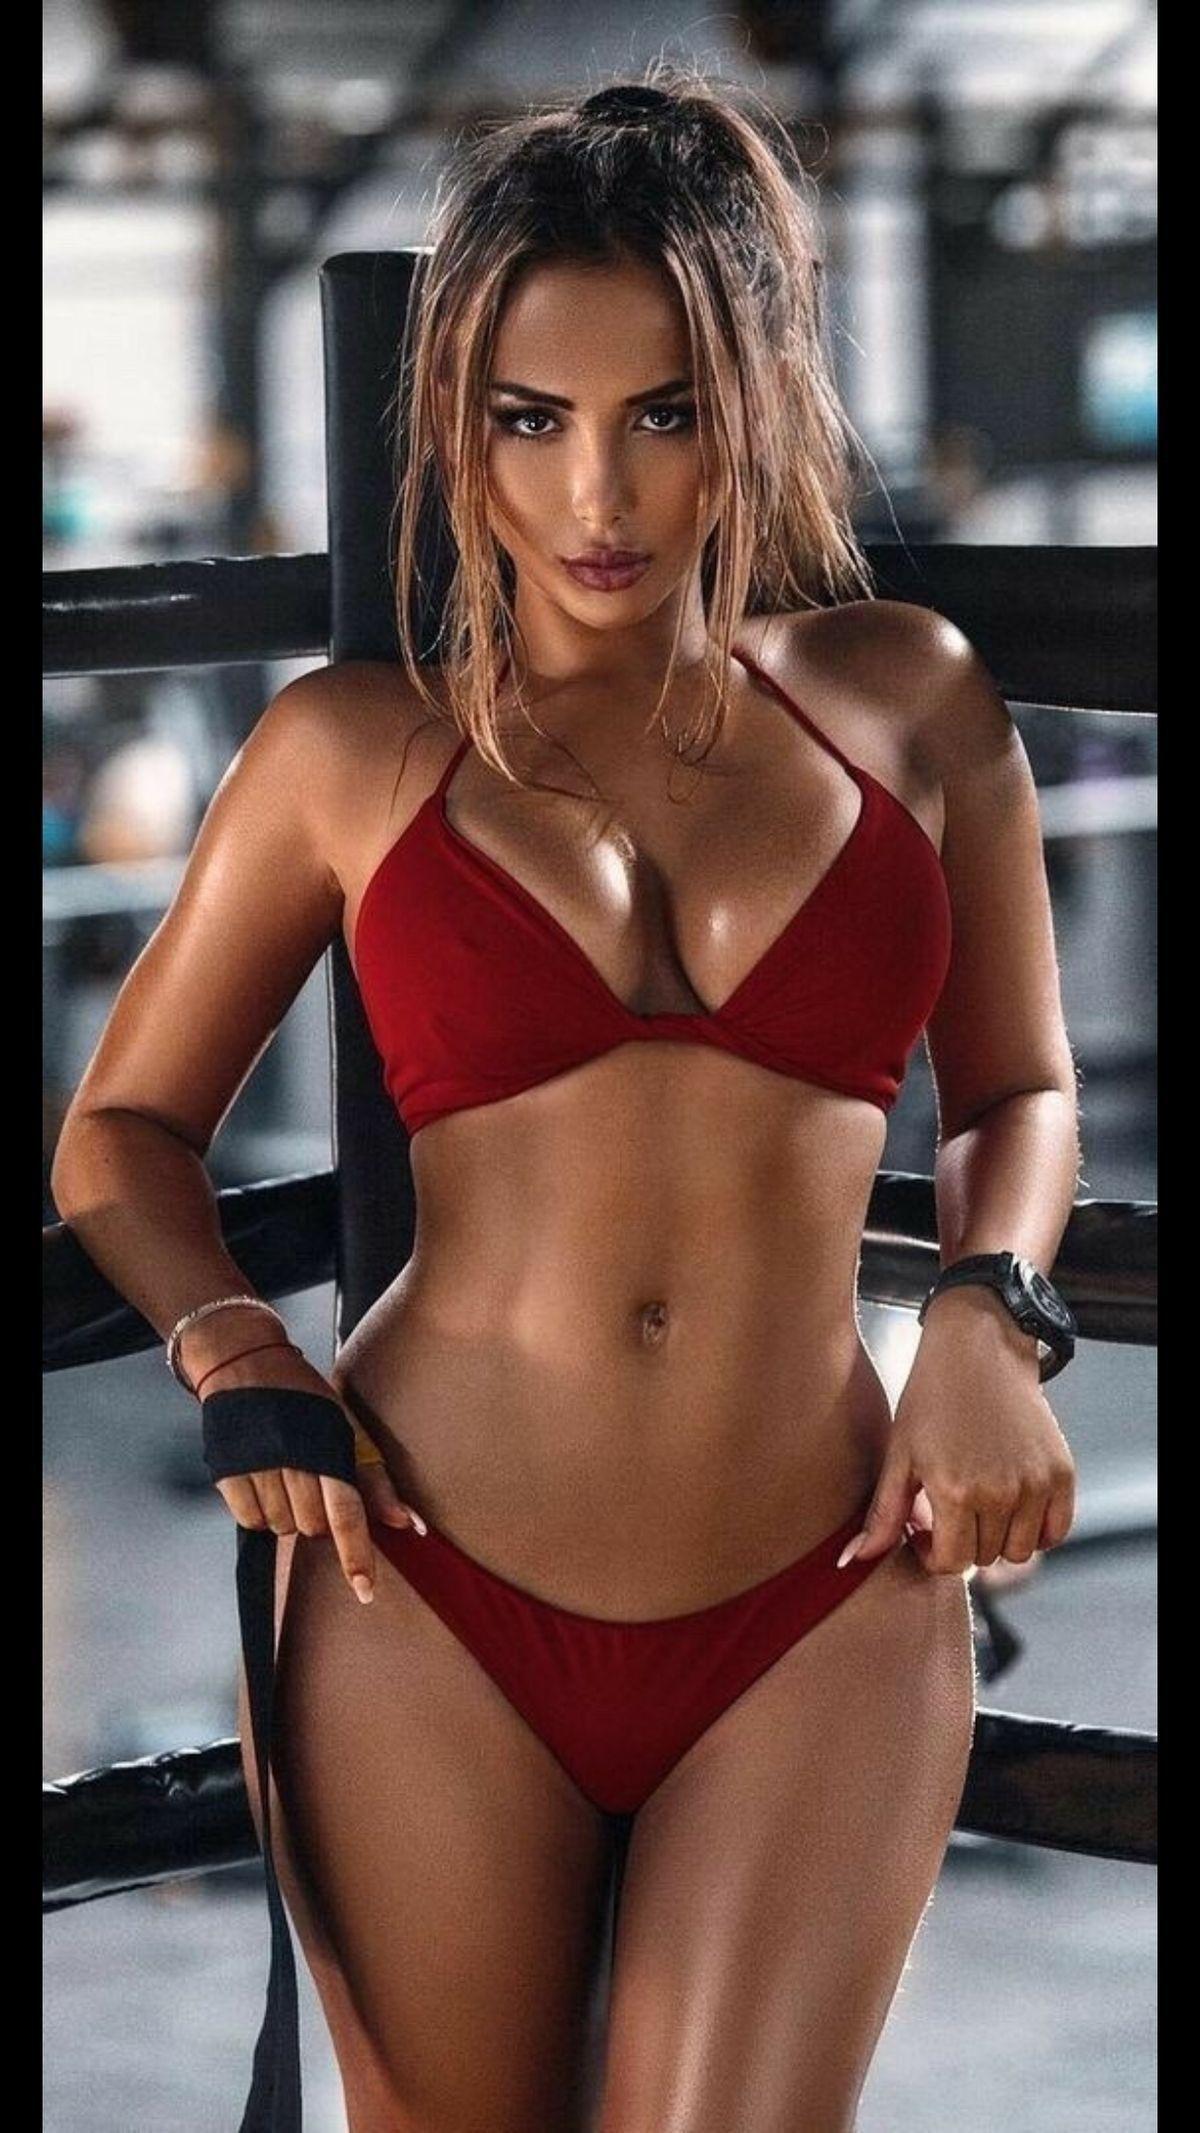 Paparazzi Bianca Kmiec nudes (15 foto and video), Tits, Cleavage, Selfie, lingerie 2018